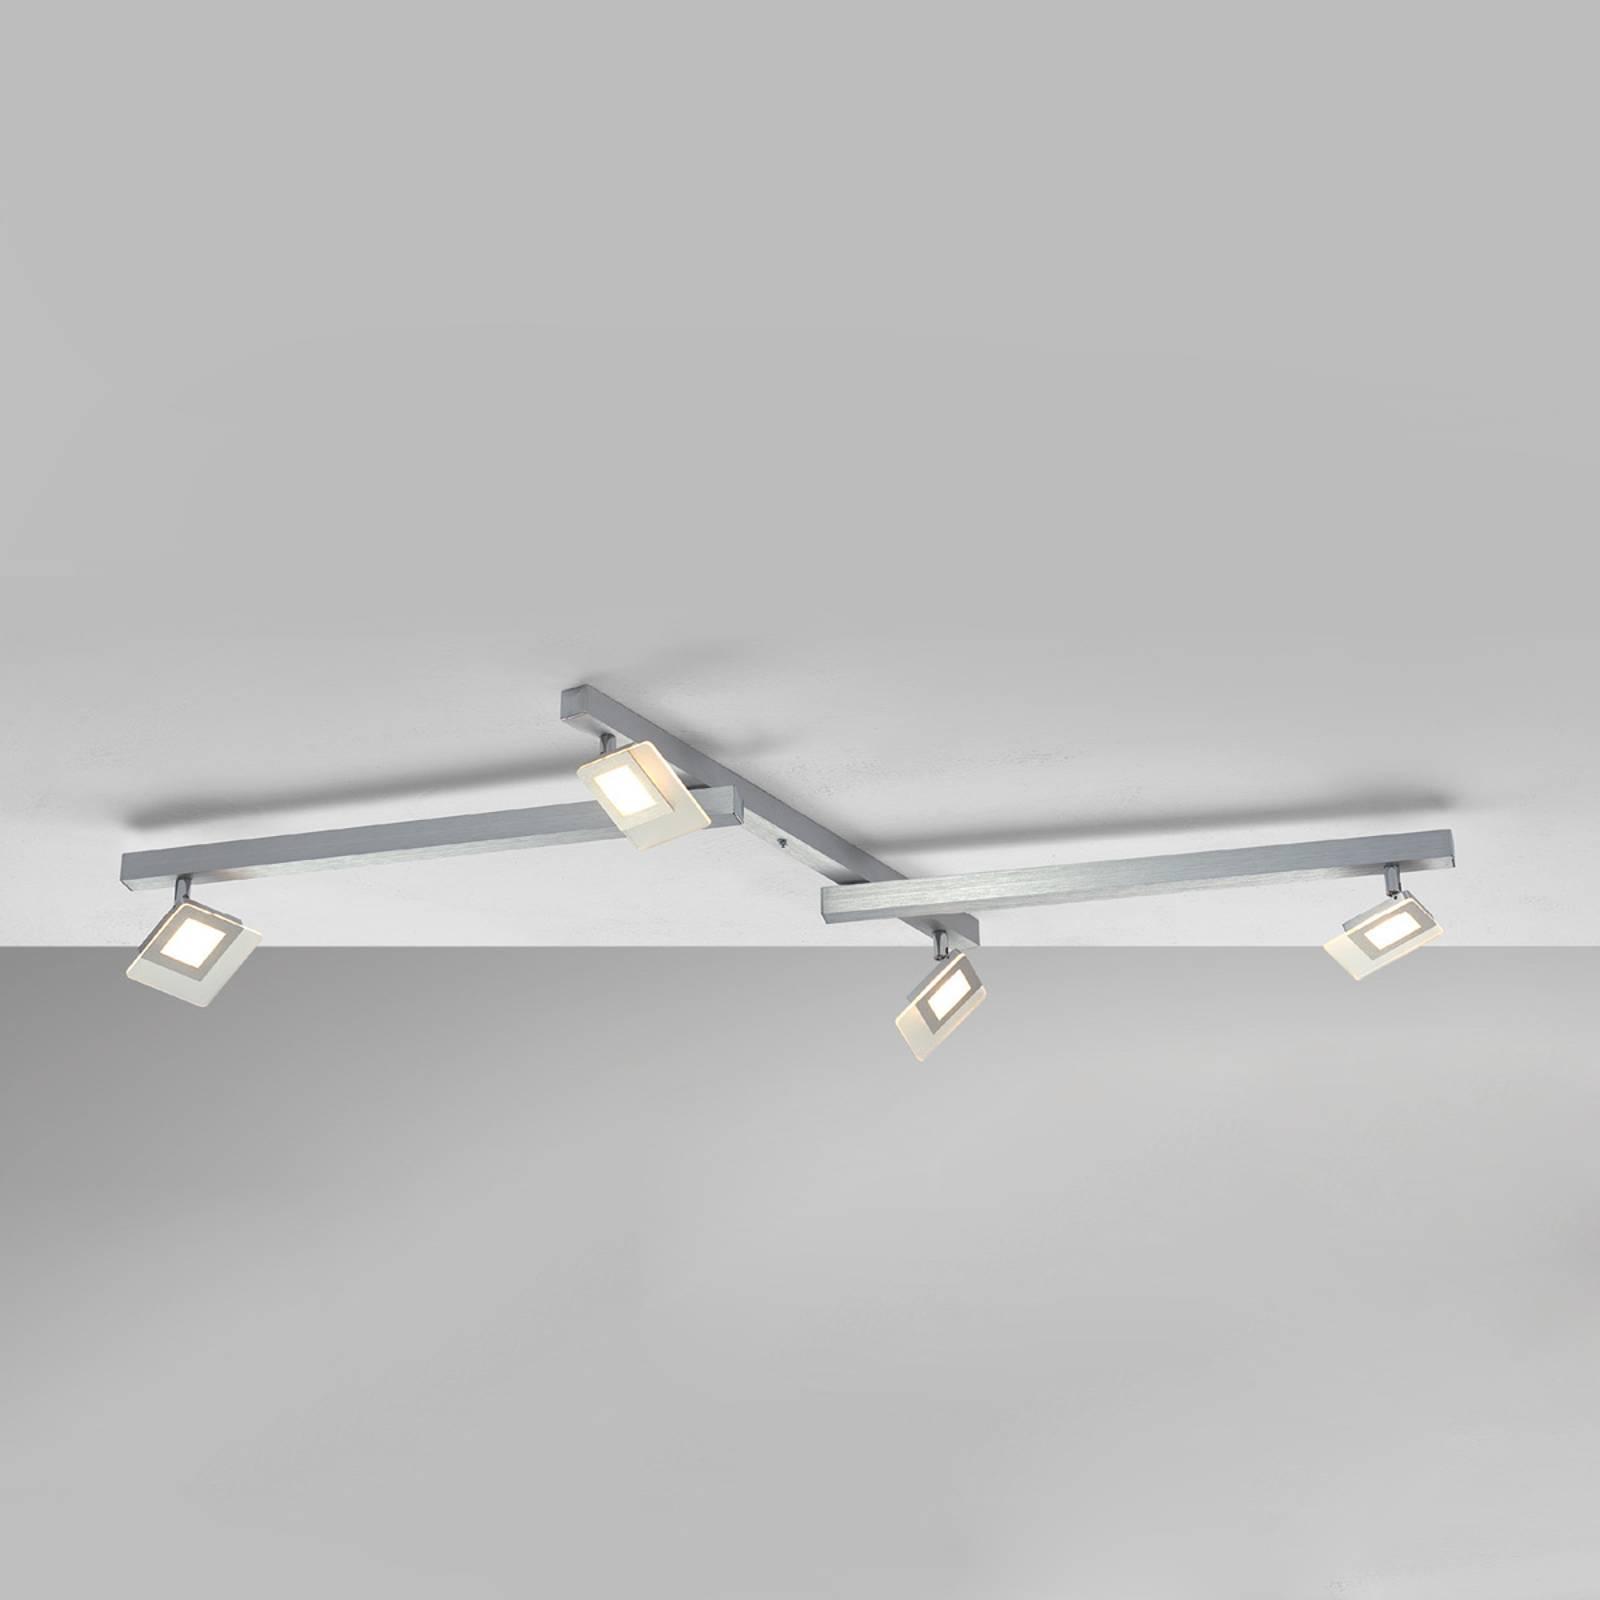 Ekskluzywna lampa sufitowa LED Line, 4-punktowa